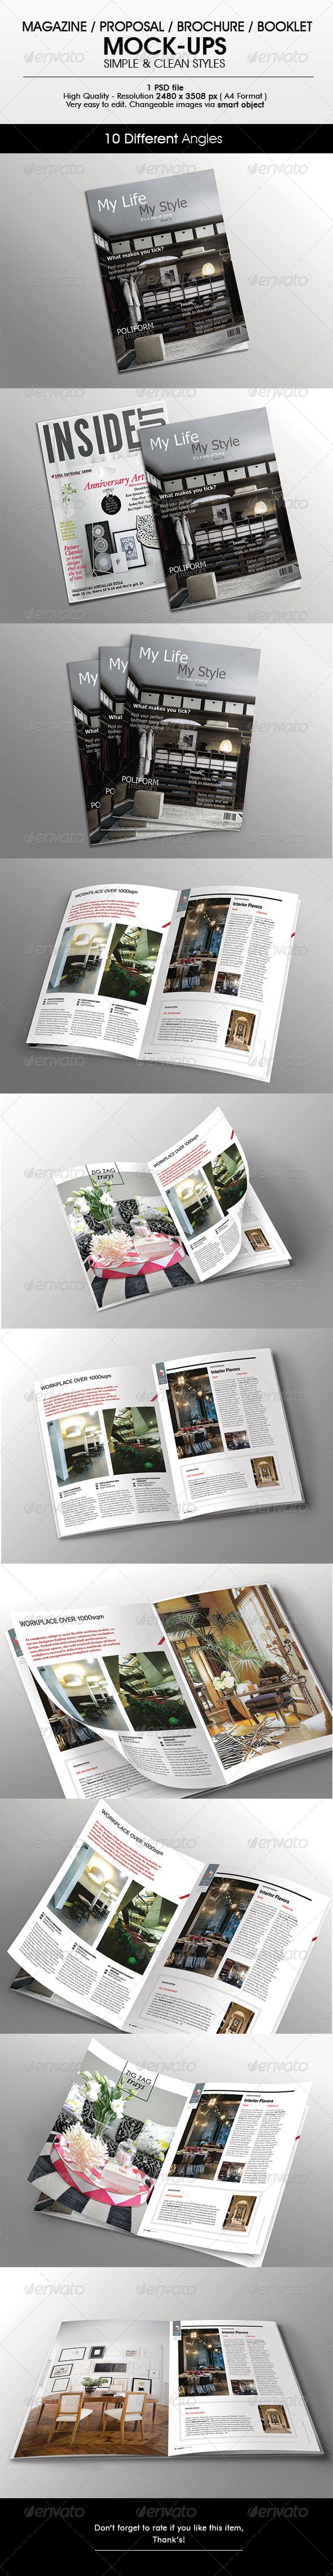 Magazine / Brochure Mock-Up - Magazines Print